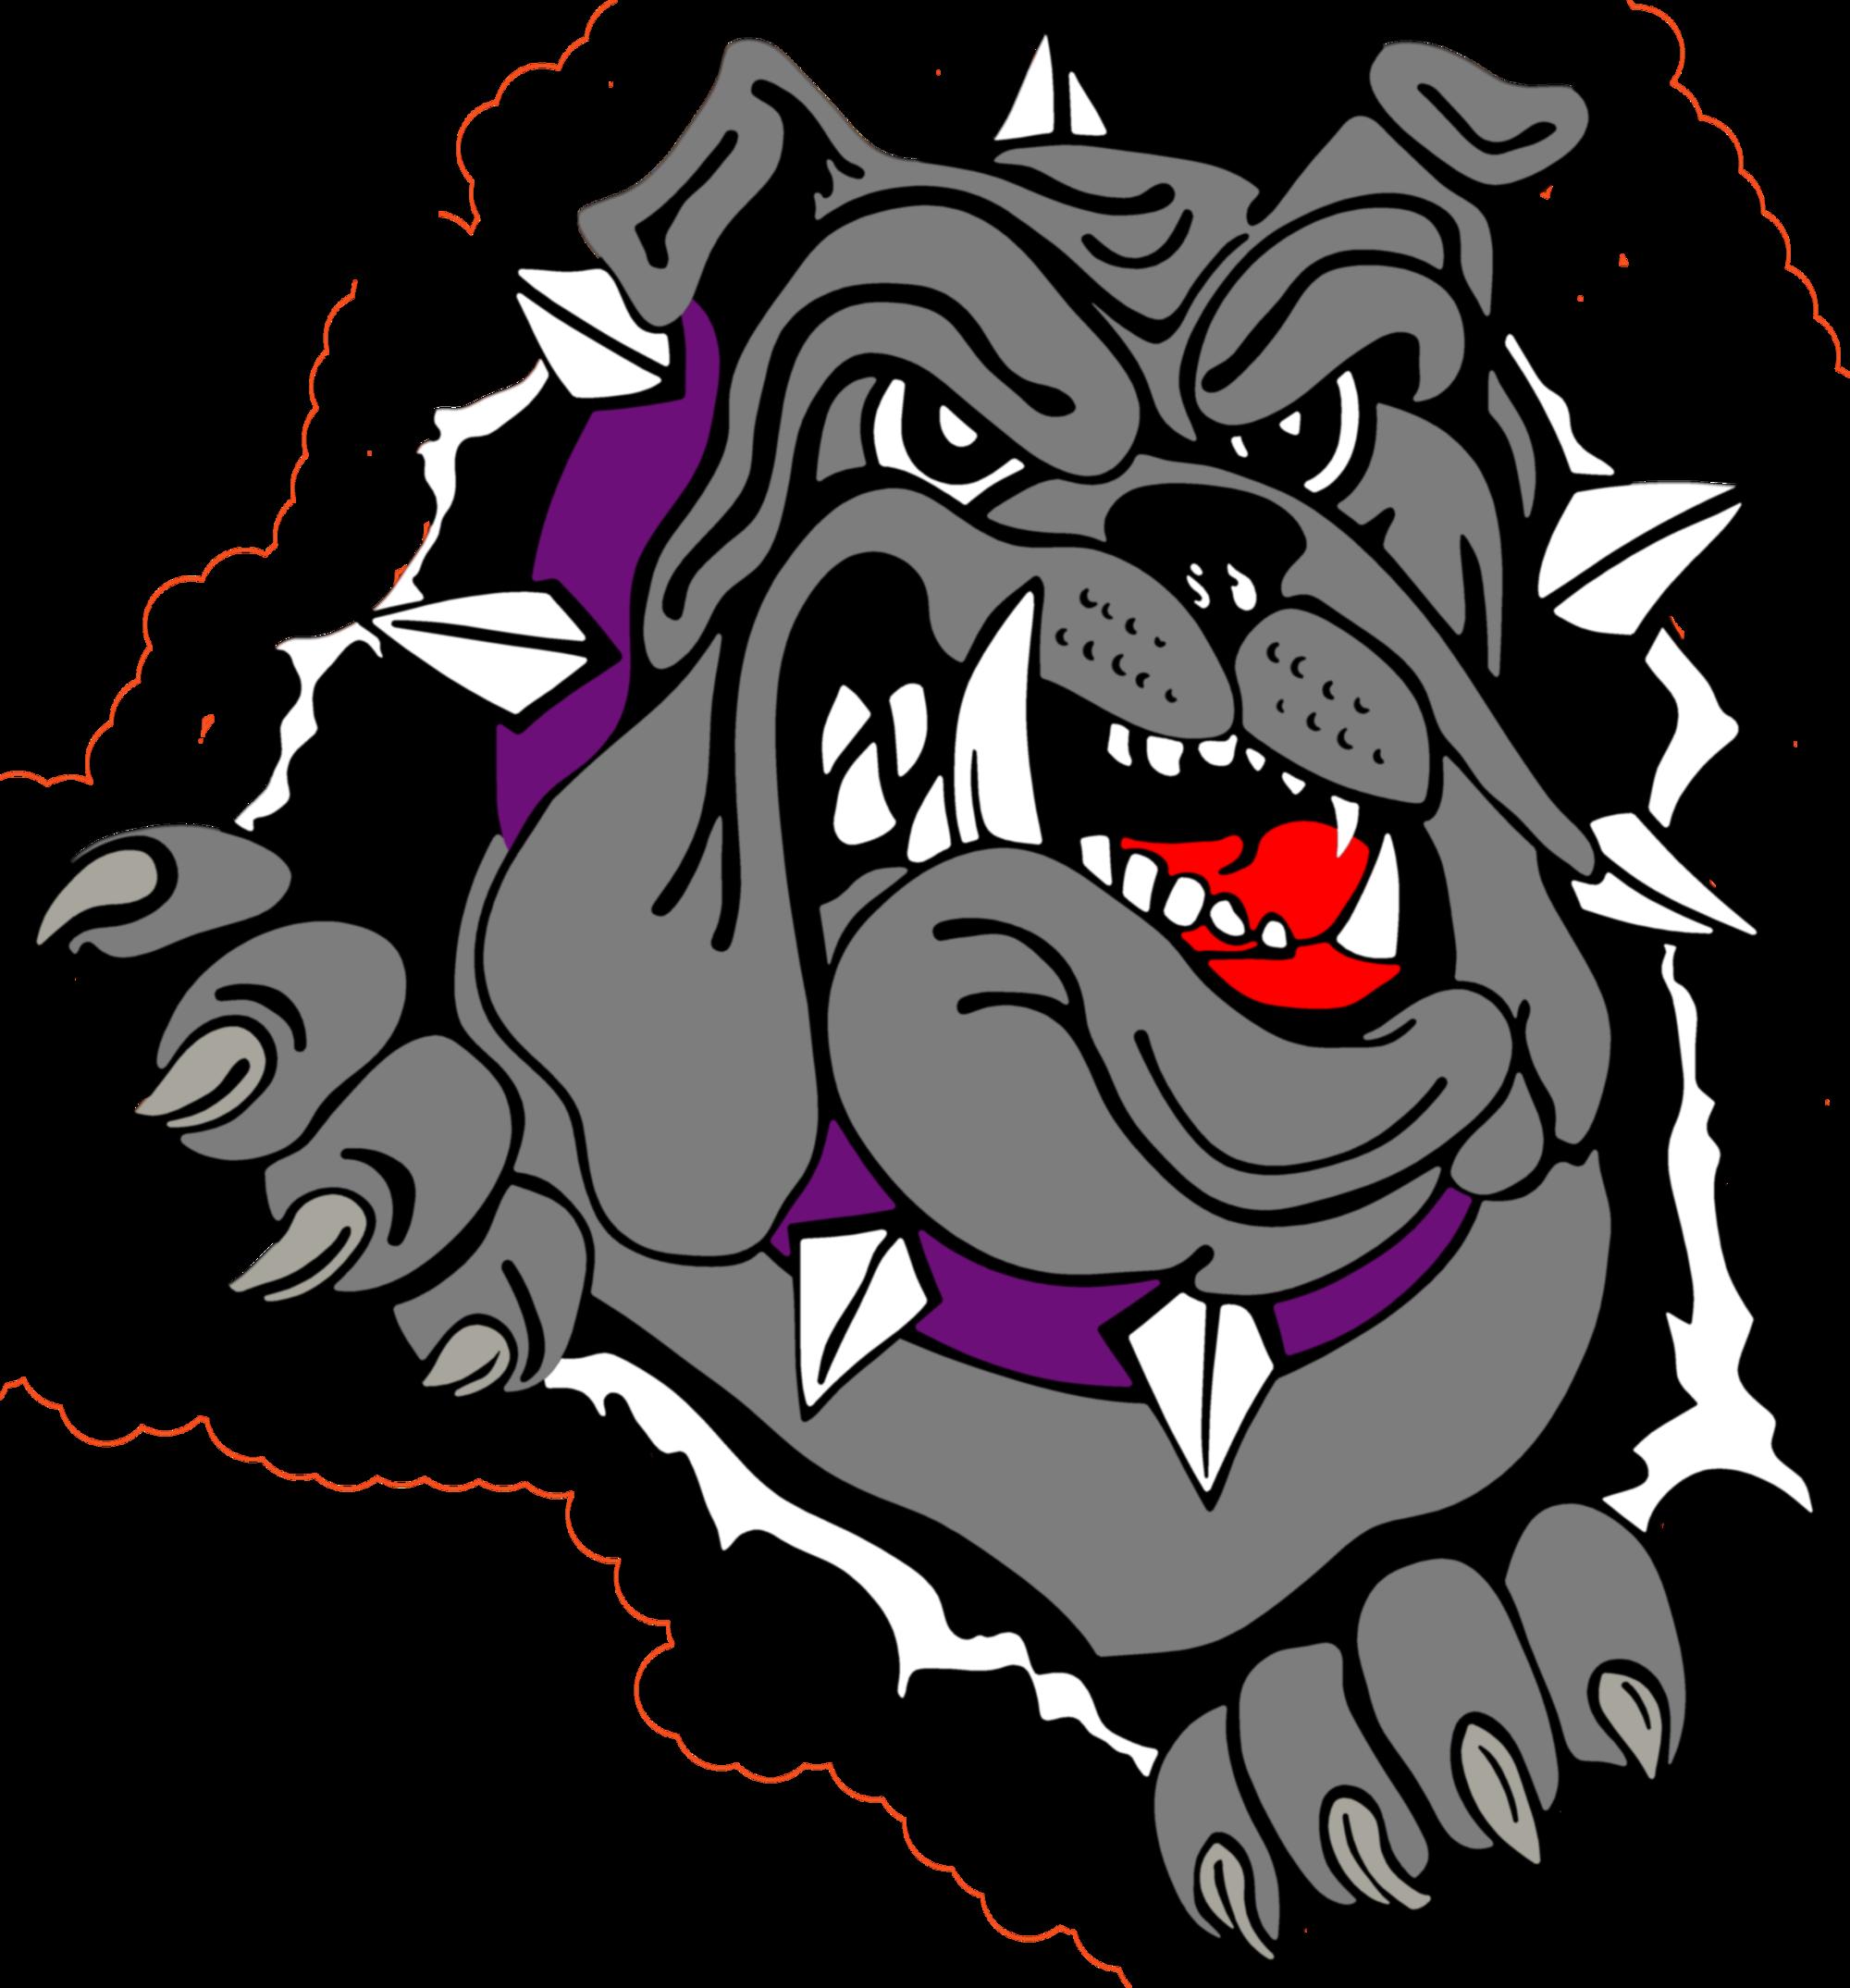 Bulldog football clipart image royalty free stock The Mullin Bulldogs - ScoreStream image royalty free stock